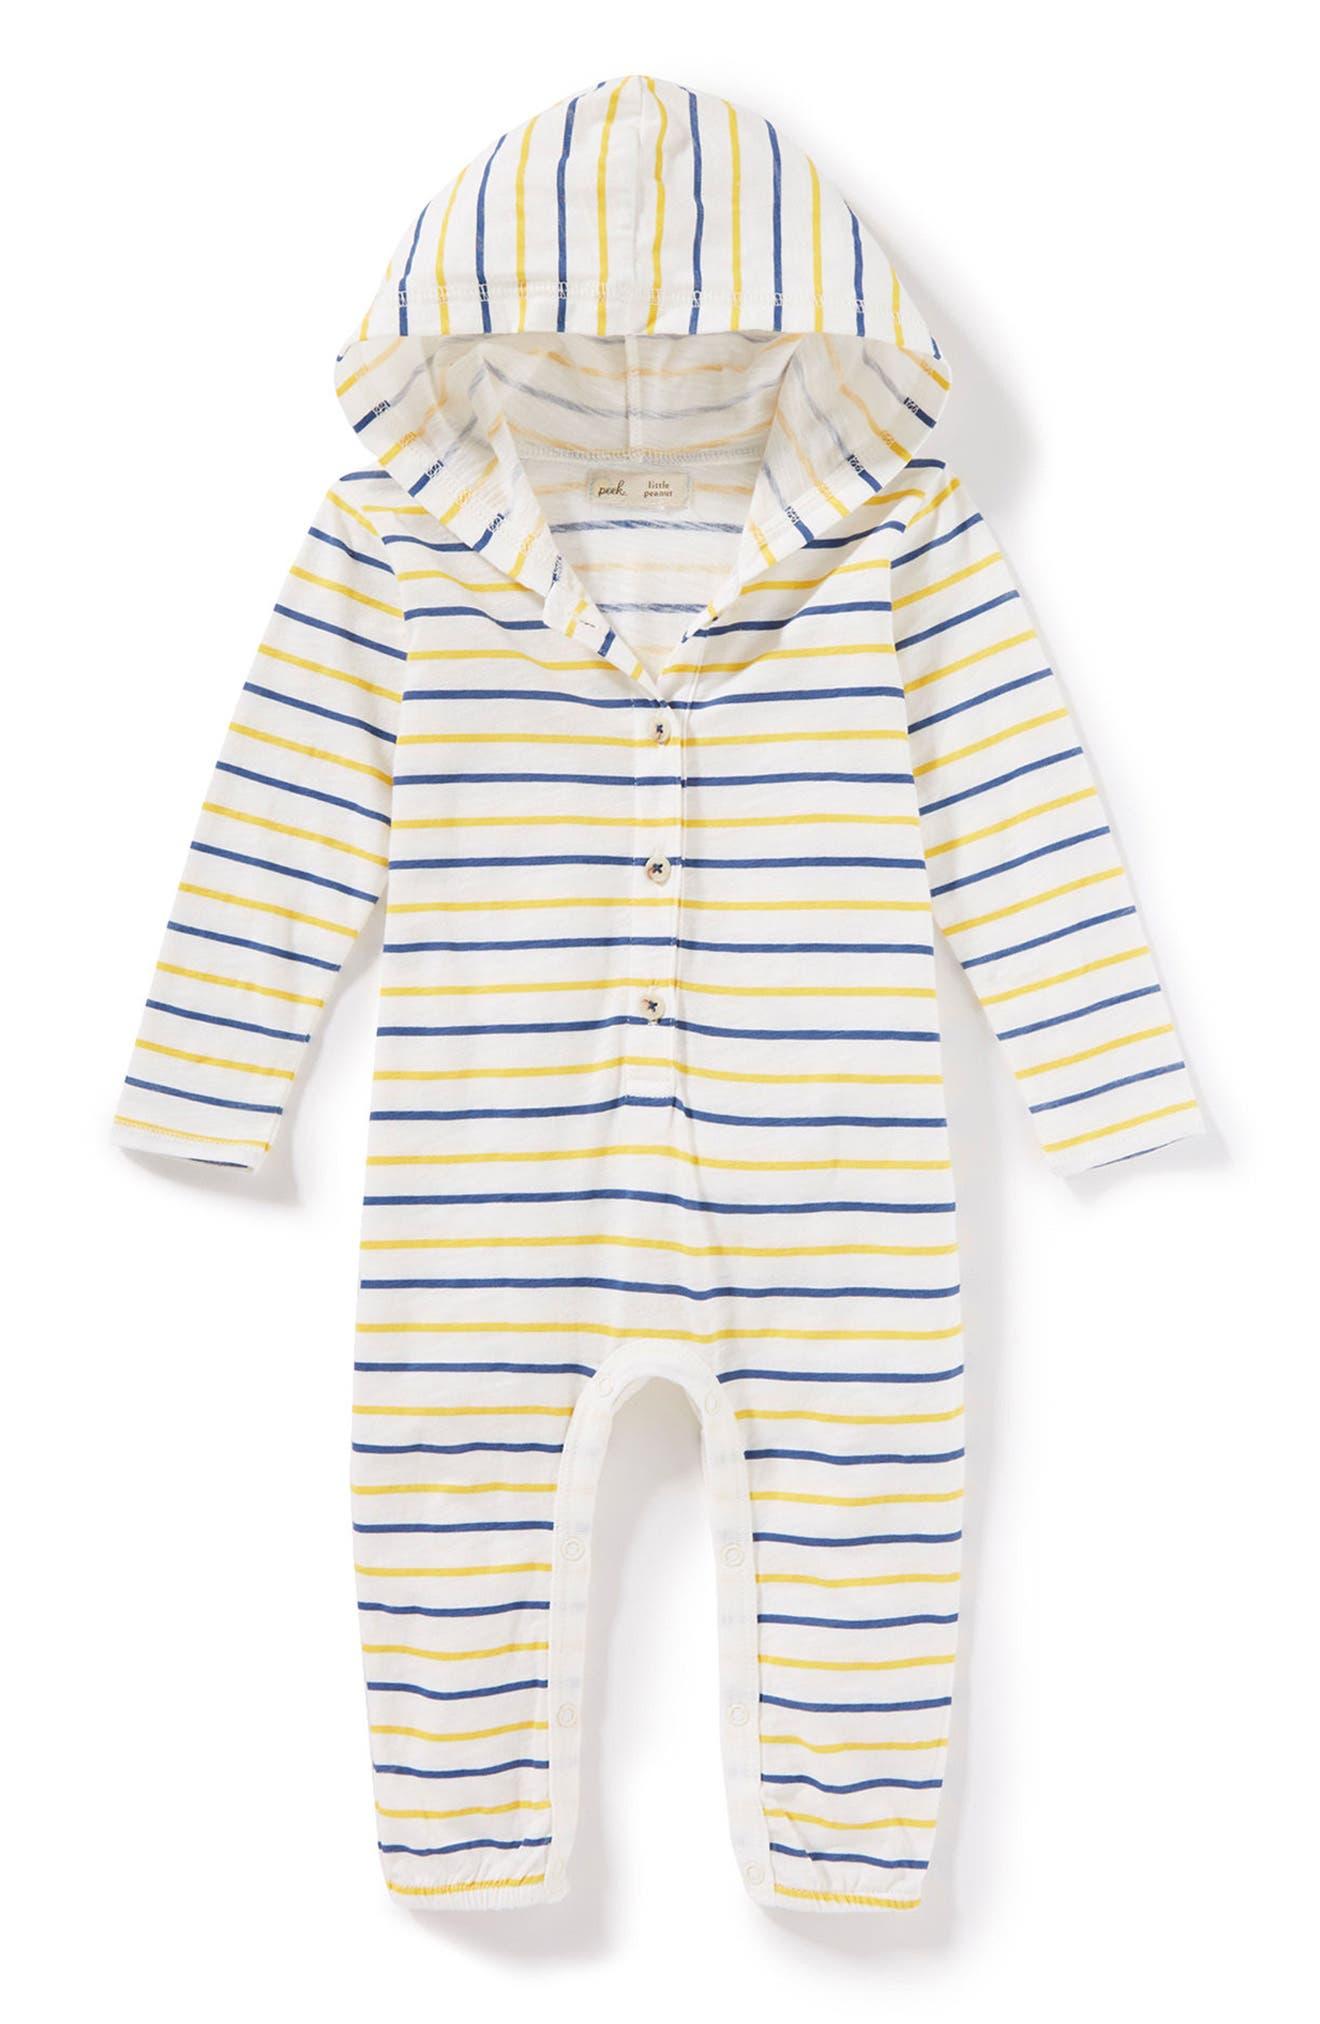 Peek Stripe Hooded Romper (Baby Boys)